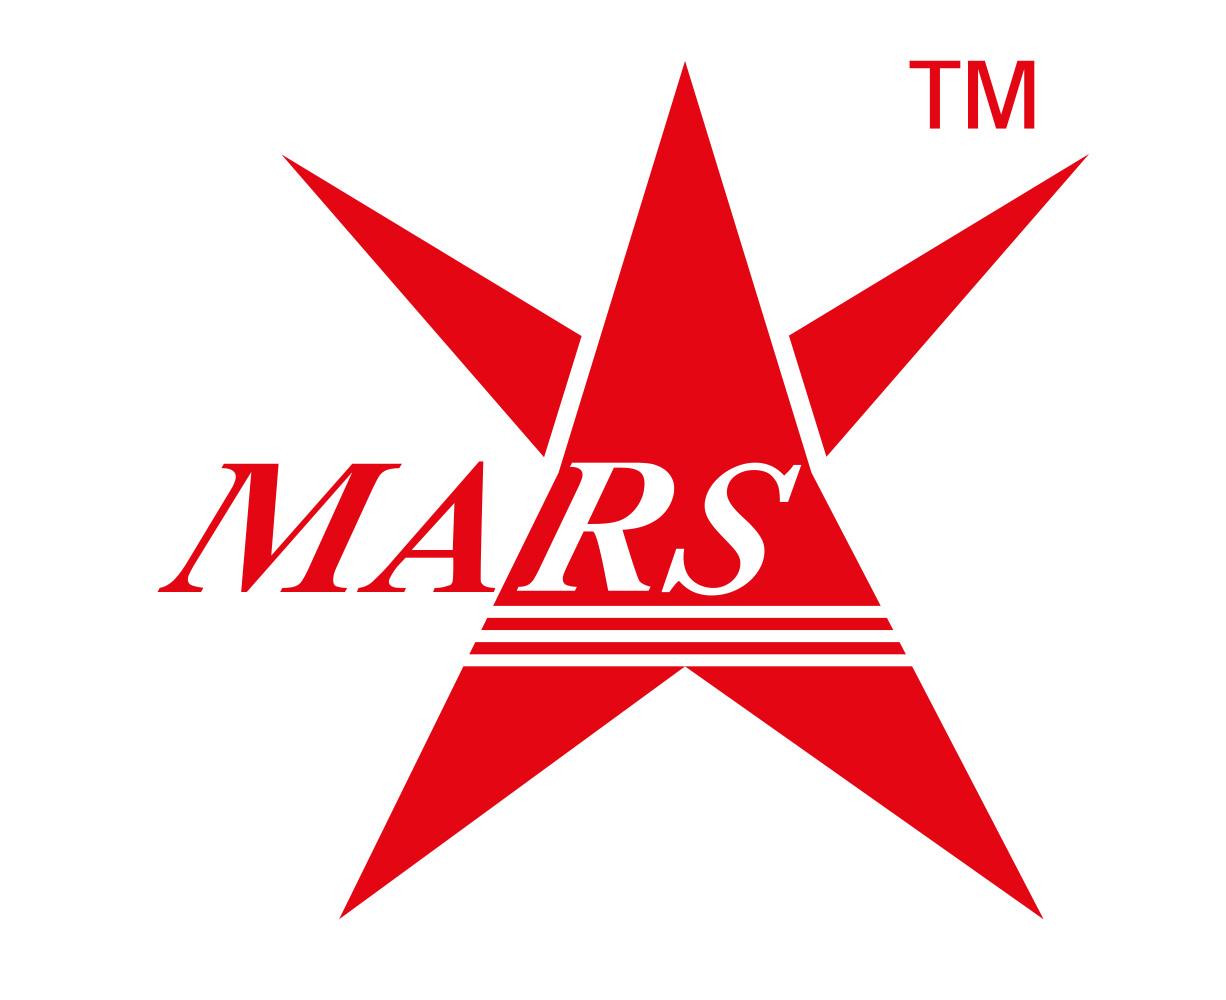 Mars Valves